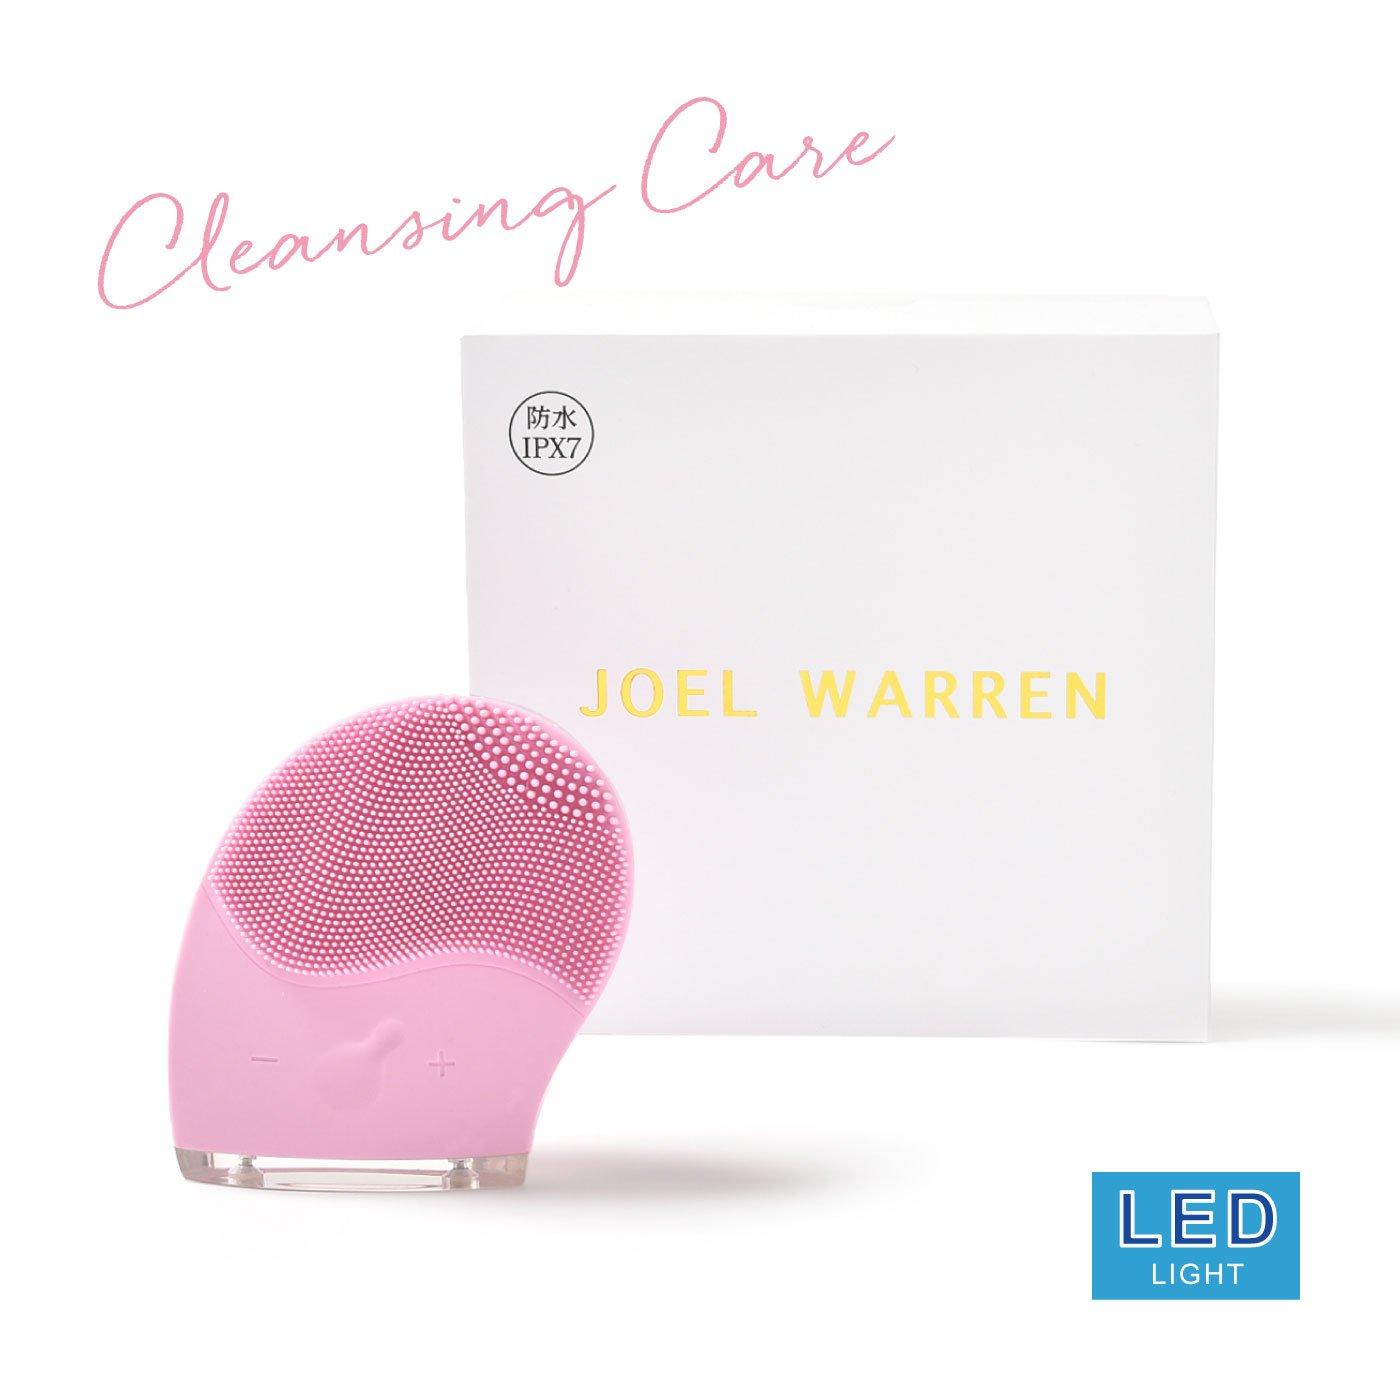 Joel Warren 振動でクレンジング&タッピング シリコン洗顔器